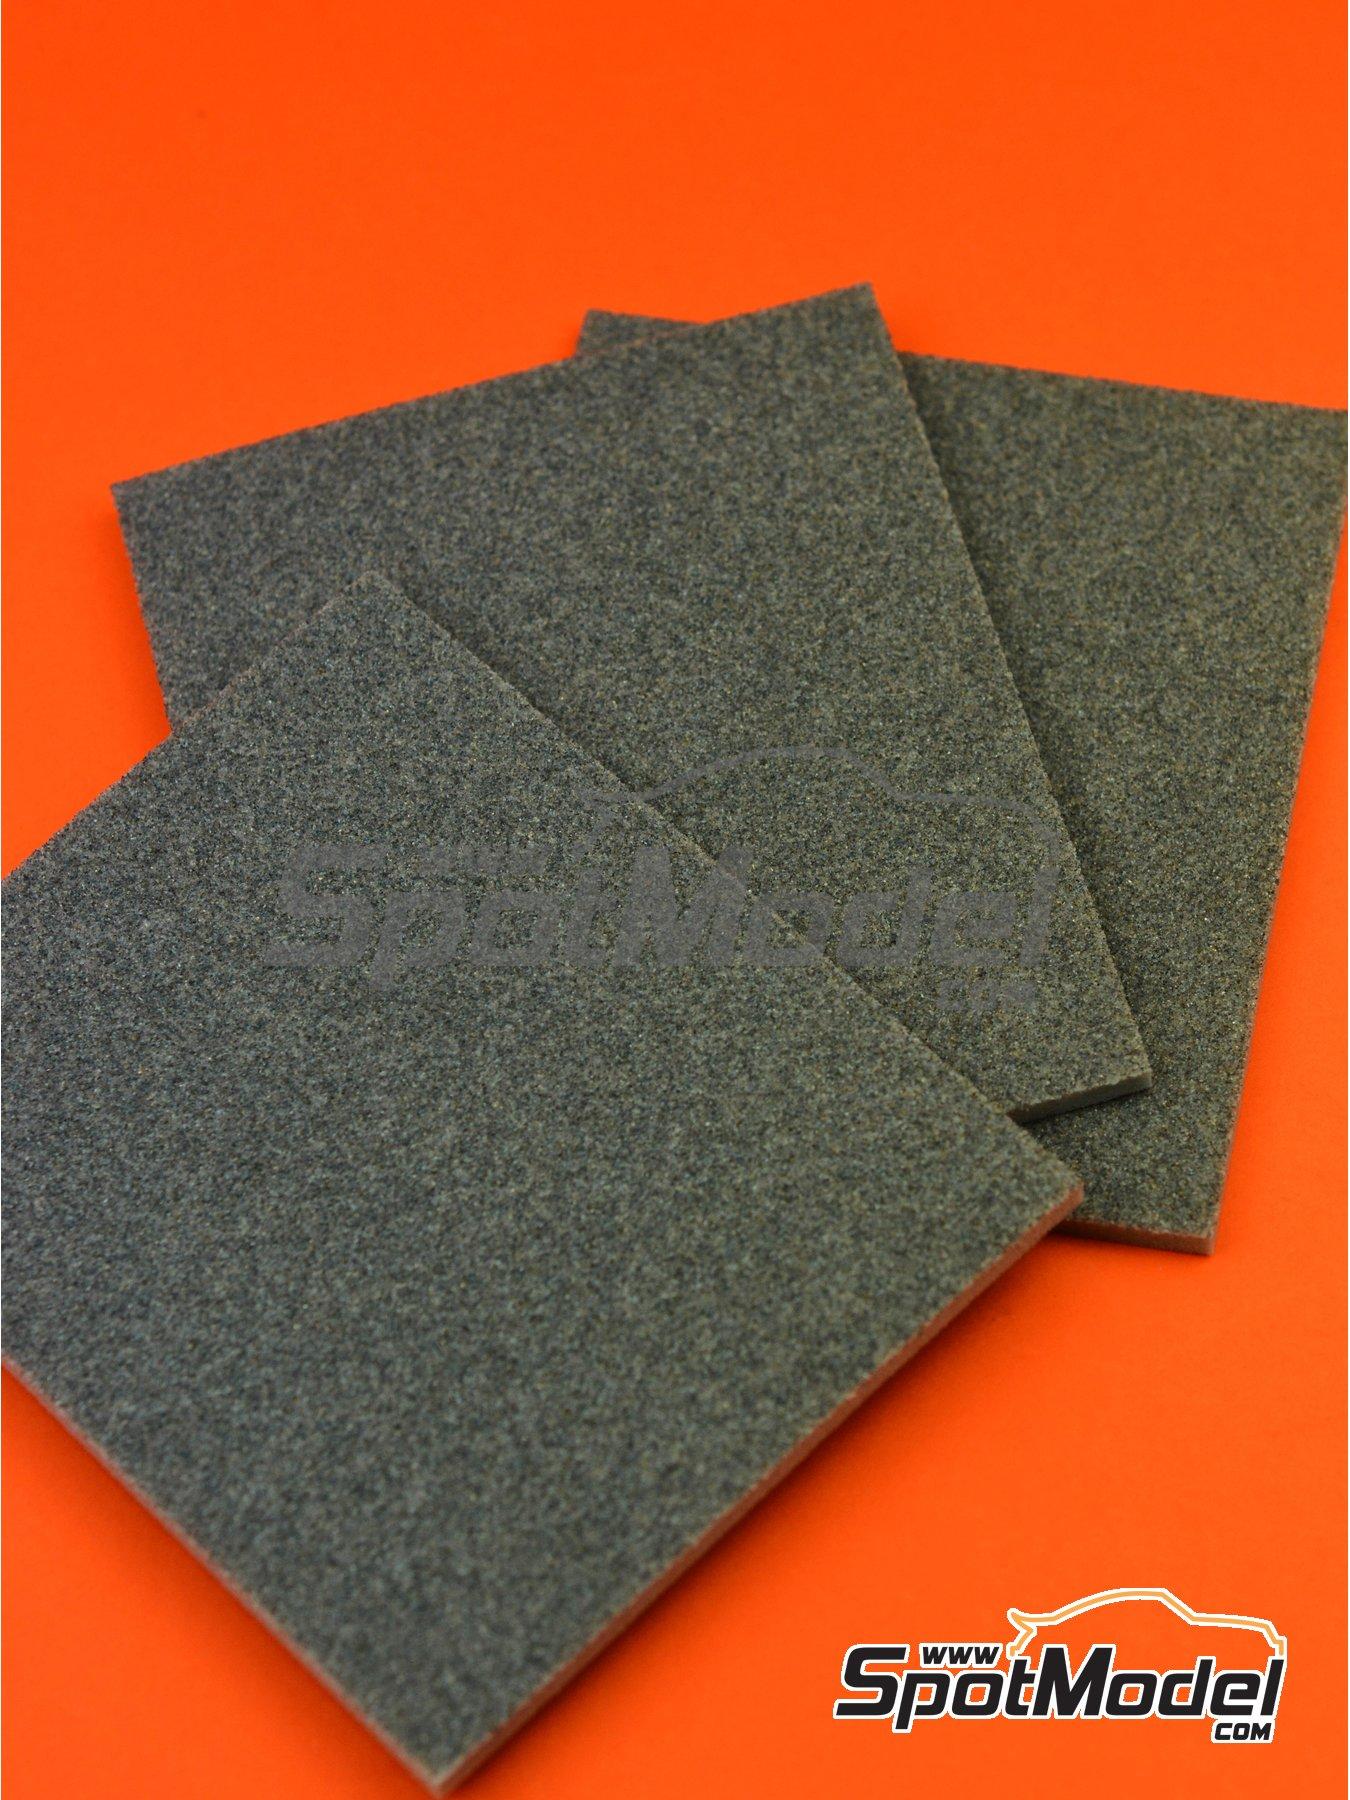 Fine grade sanding sponge (400 grit) | Sandpaper manufactured by SpotModel (ref.SPOT-011) image